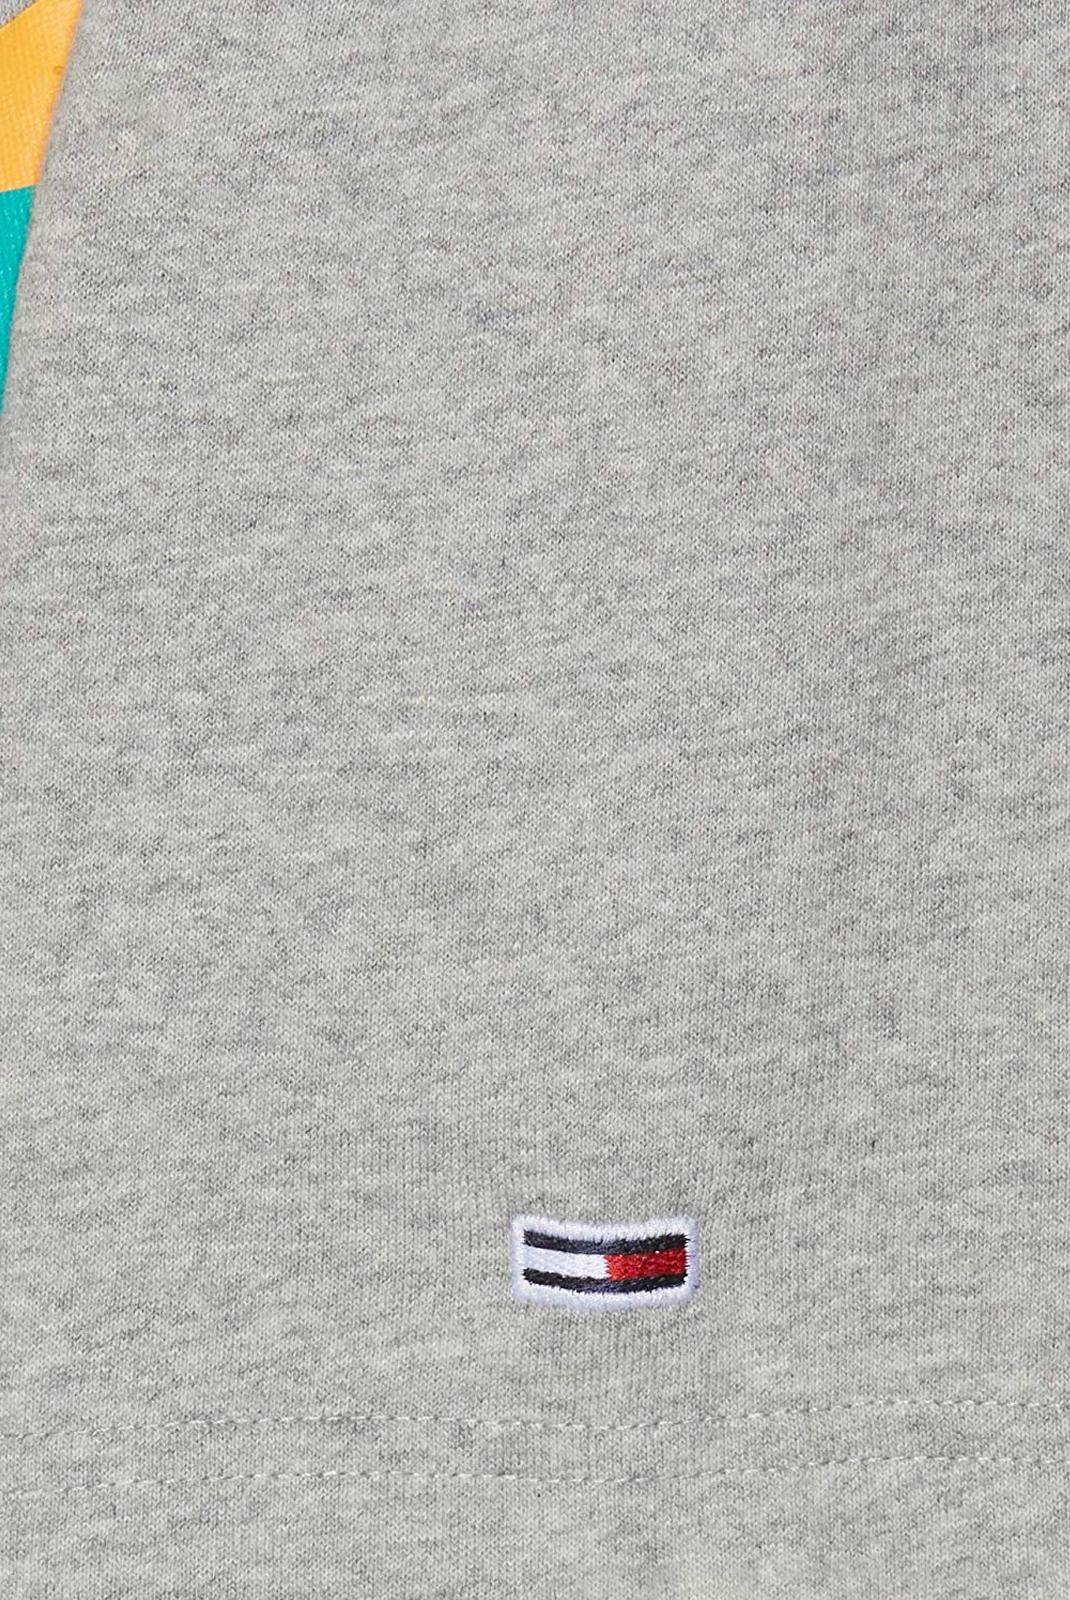 T-S manches courtes  Tommy Jeans DM06079 RAINBOW 038 Lt grey htr